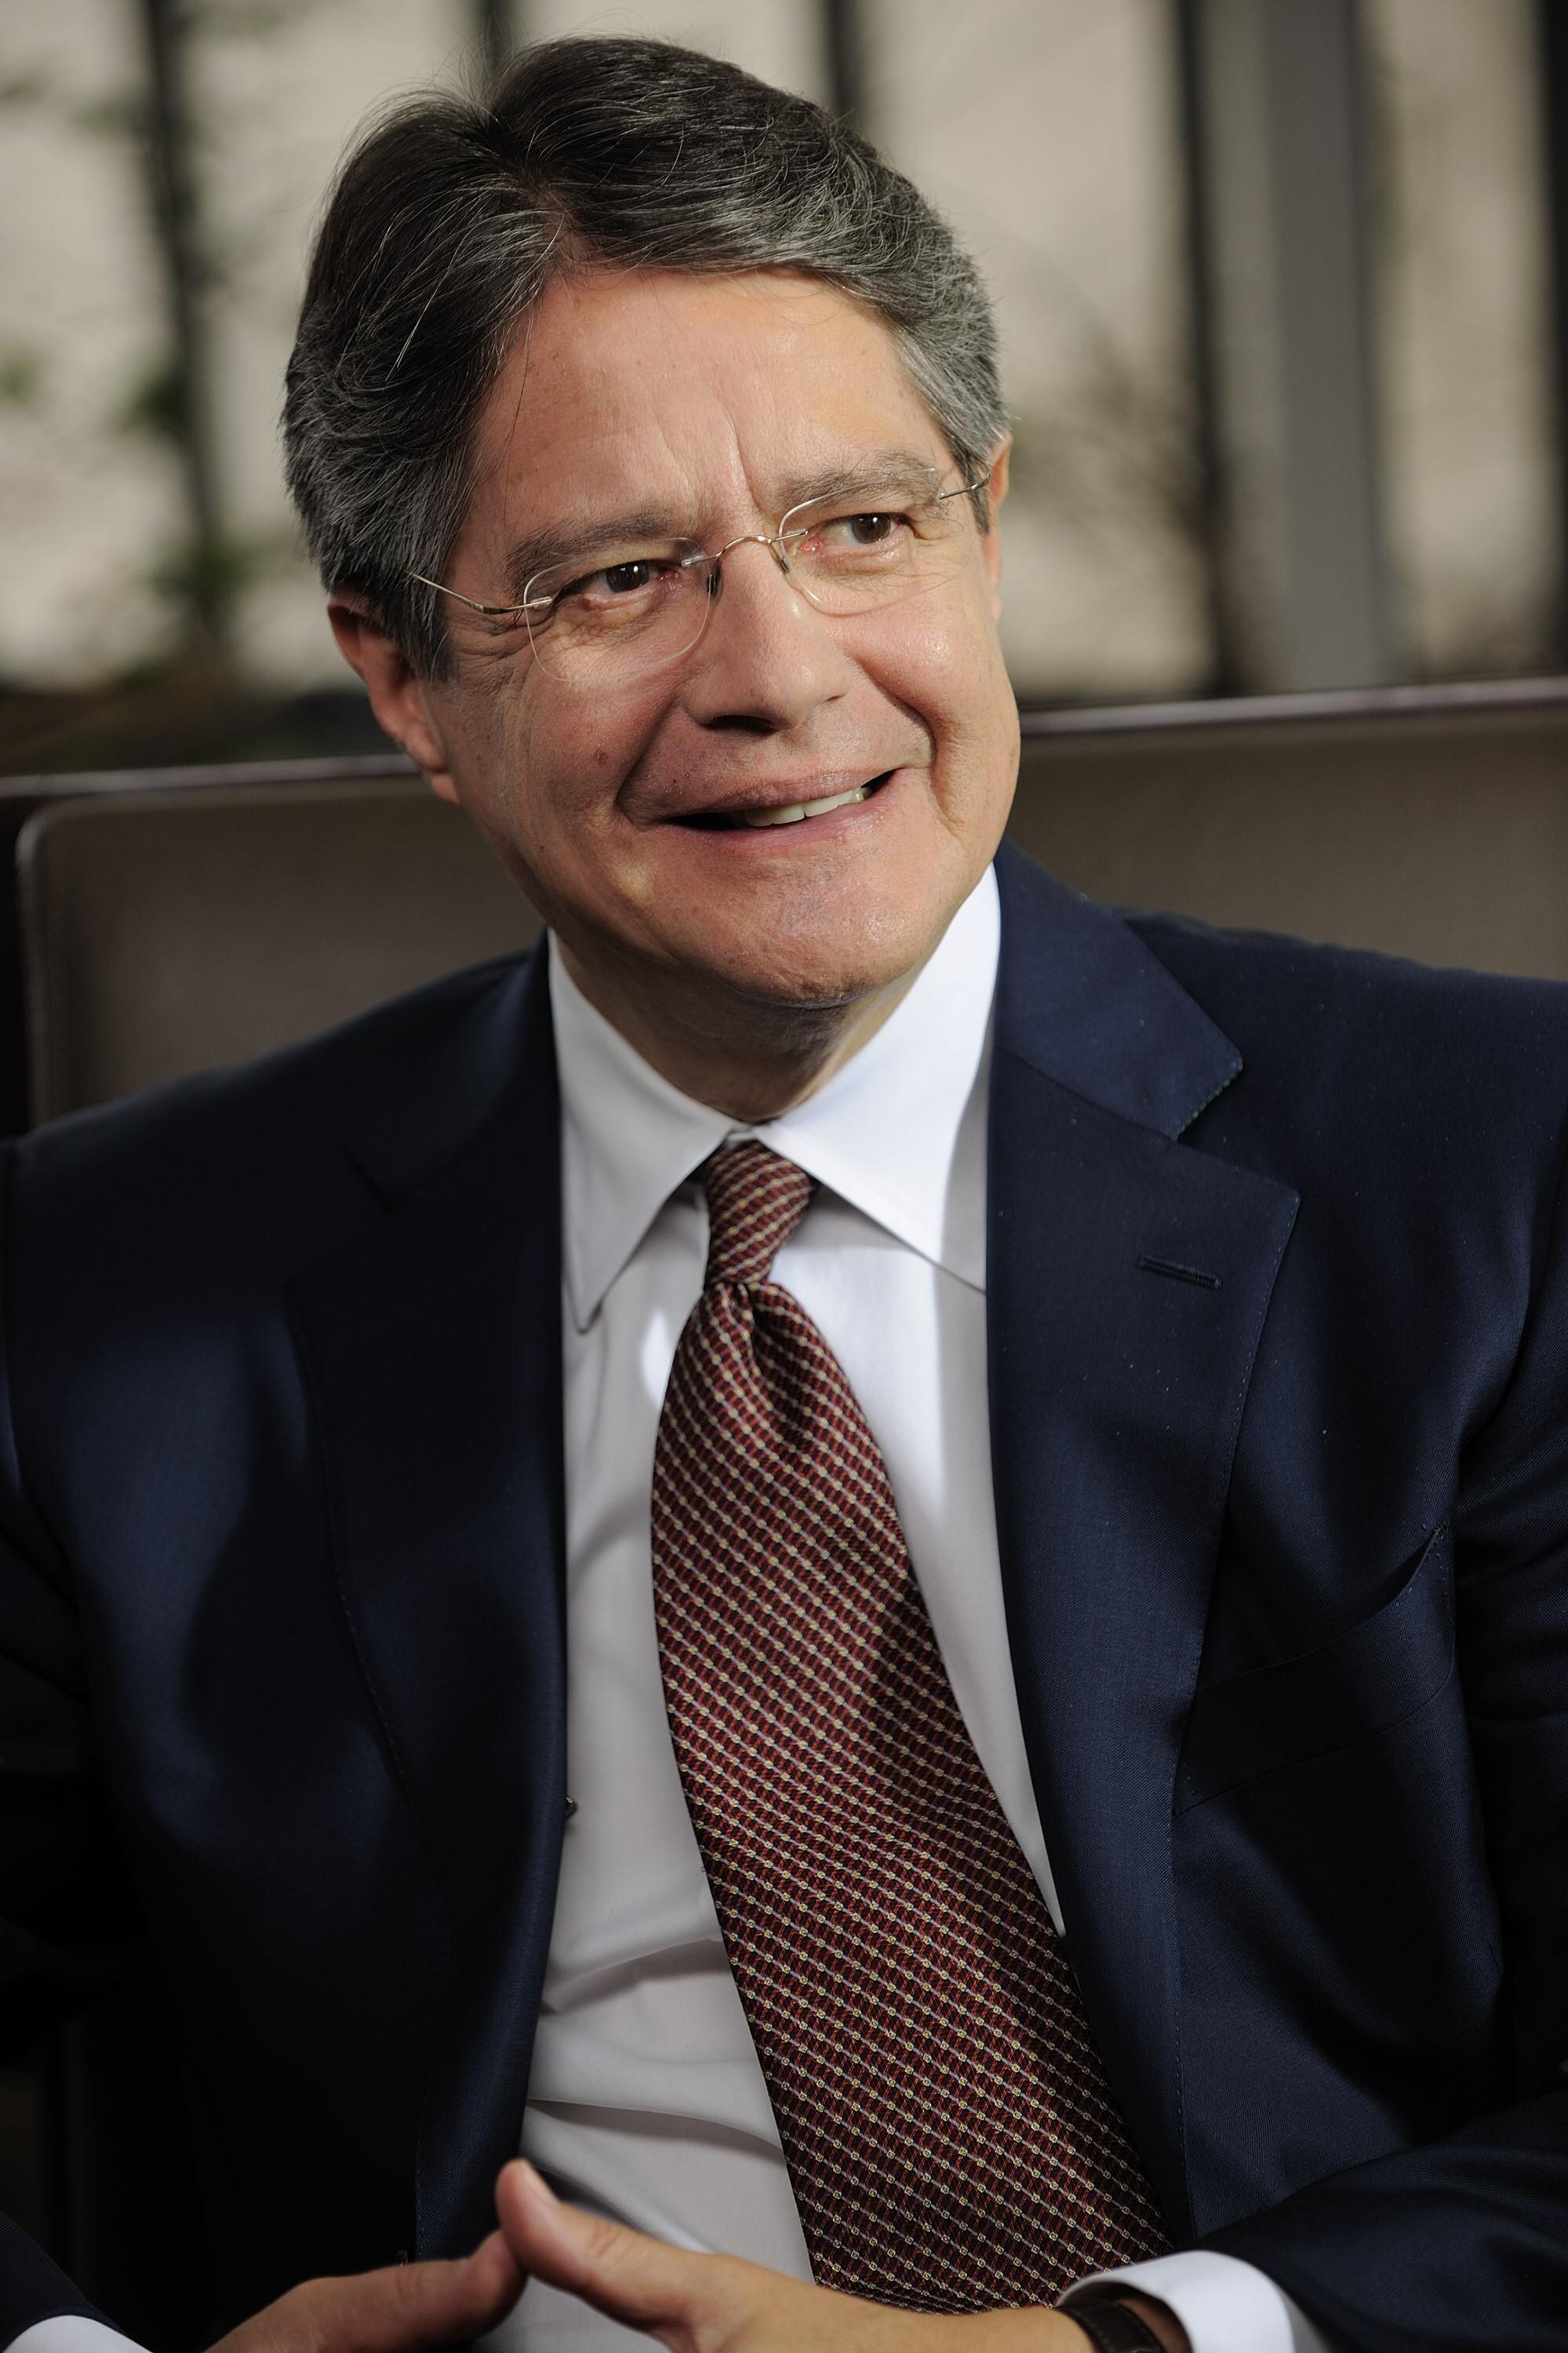 Guillermo Lasso perfil vertical.jpg